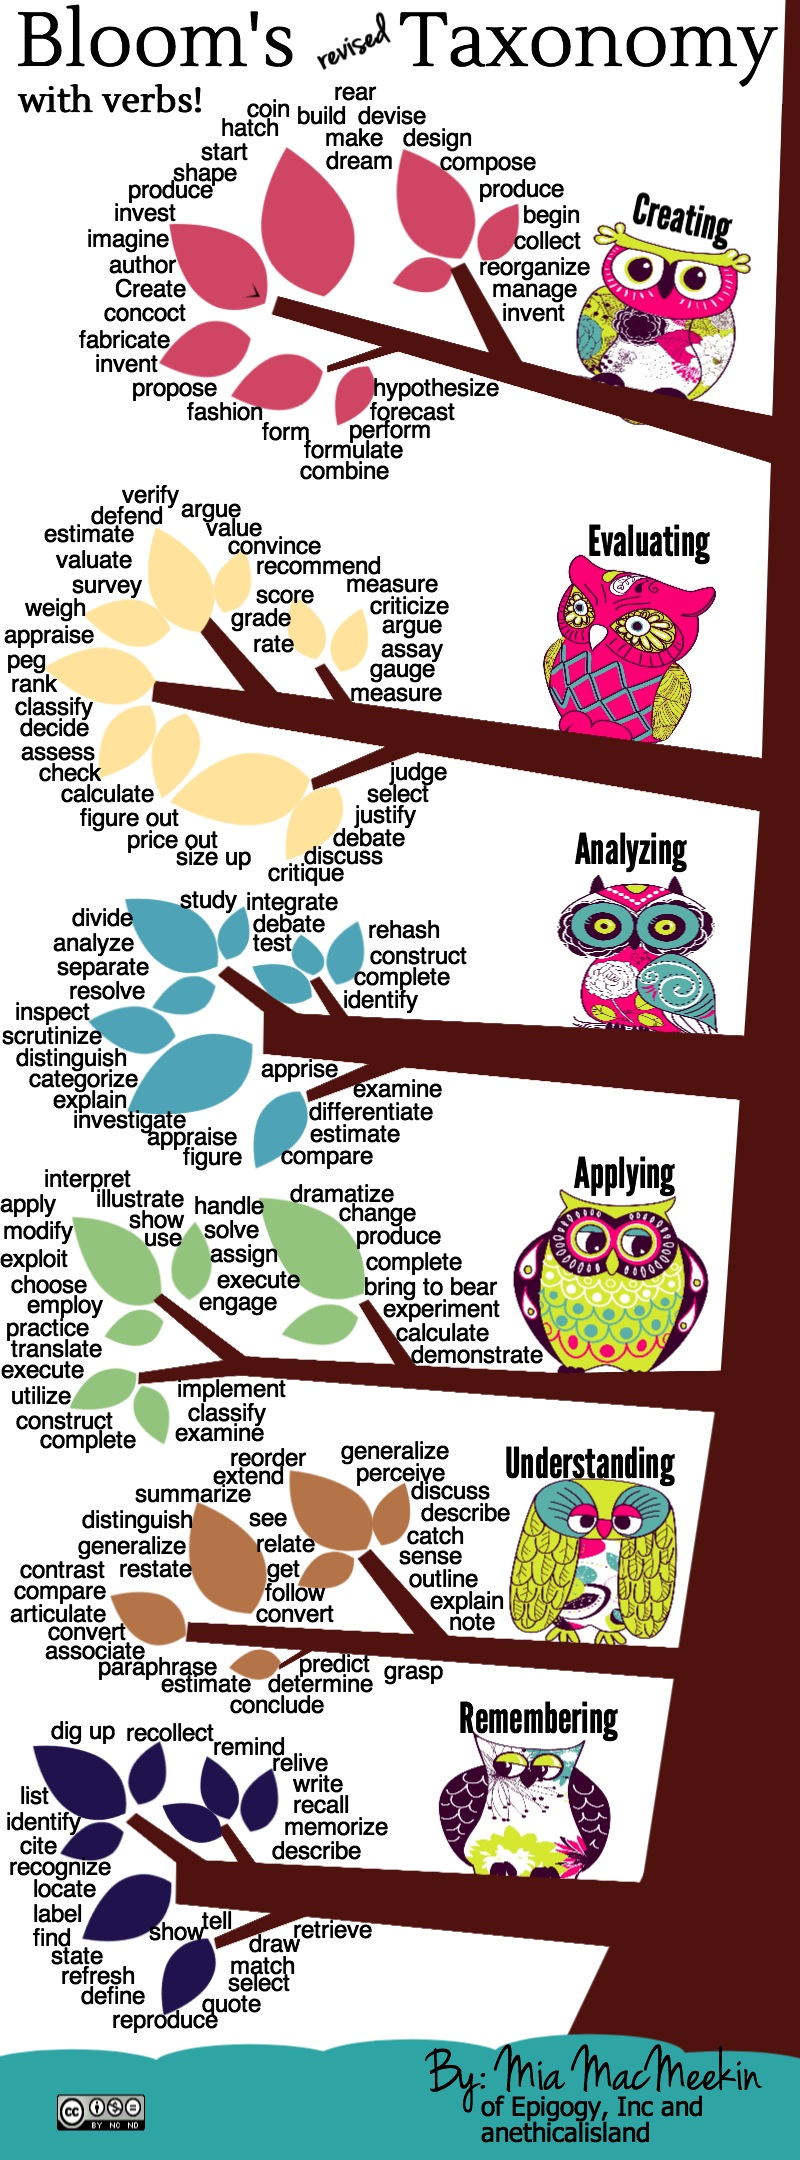 Bloom's Revised Taxonomy with Verbs by Mia MacMeekin